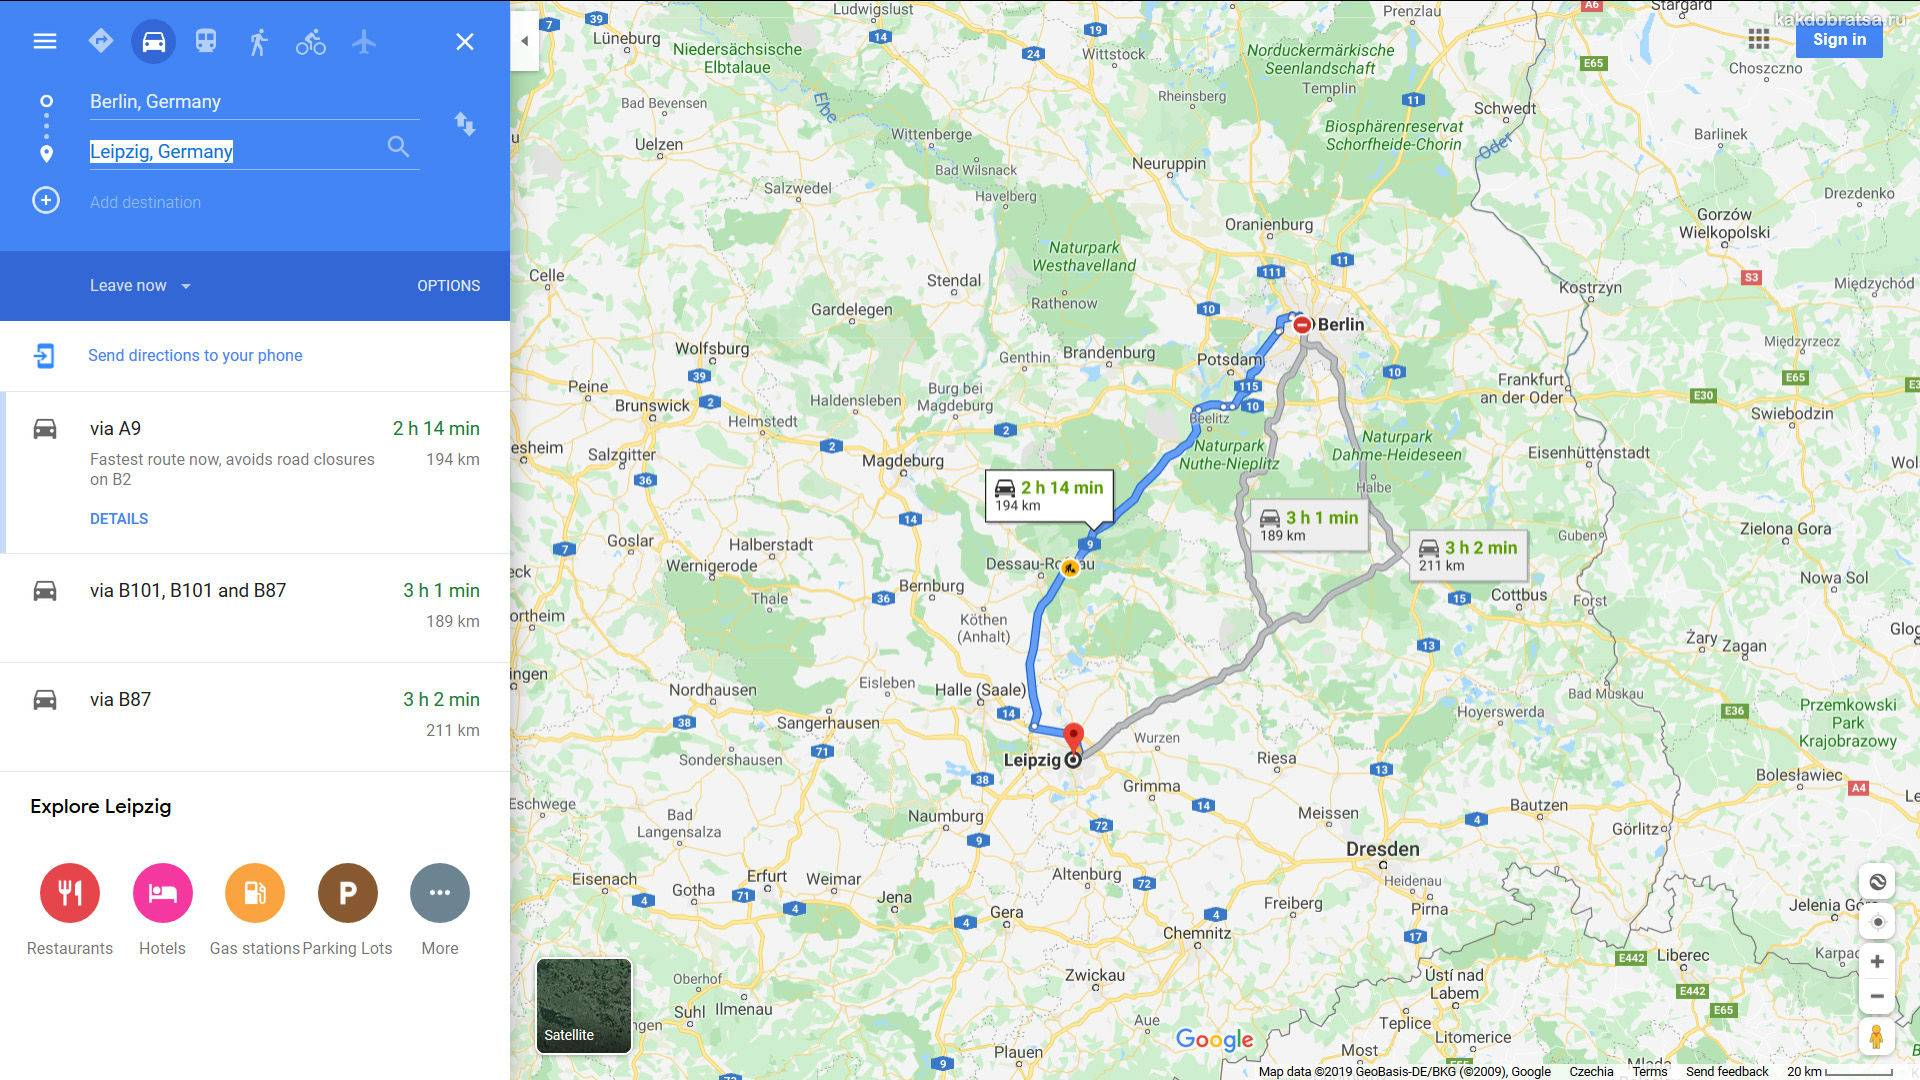 Новосибирск — берлин авиабилеты от 11859 рублей, цена билета новосибирск берлин и расписание самолетов